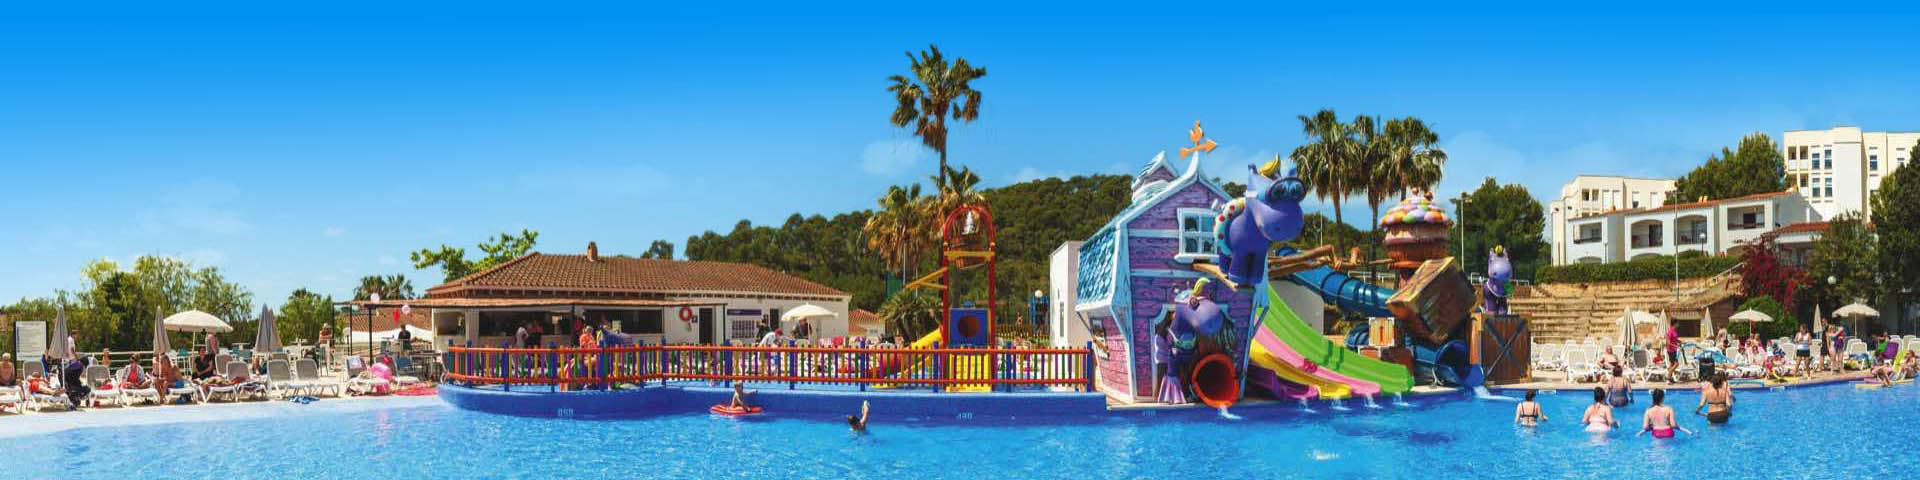 Waterpark met glijbaan in Spanje